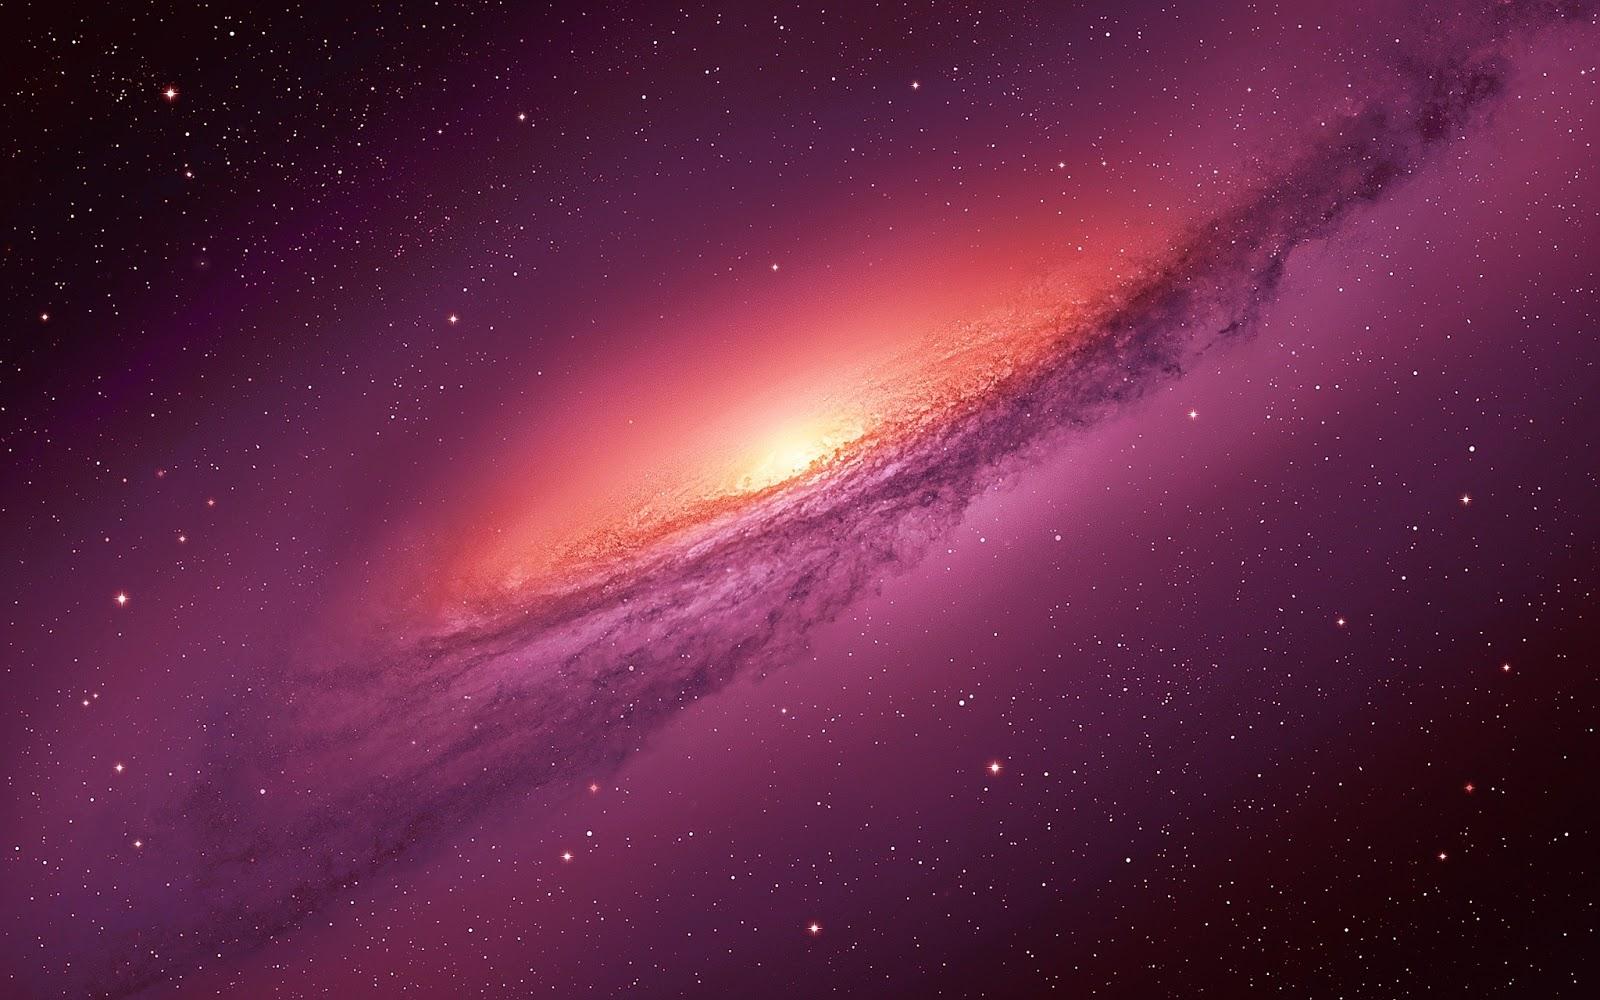 purple galaxy stars wallpaper - photo #21